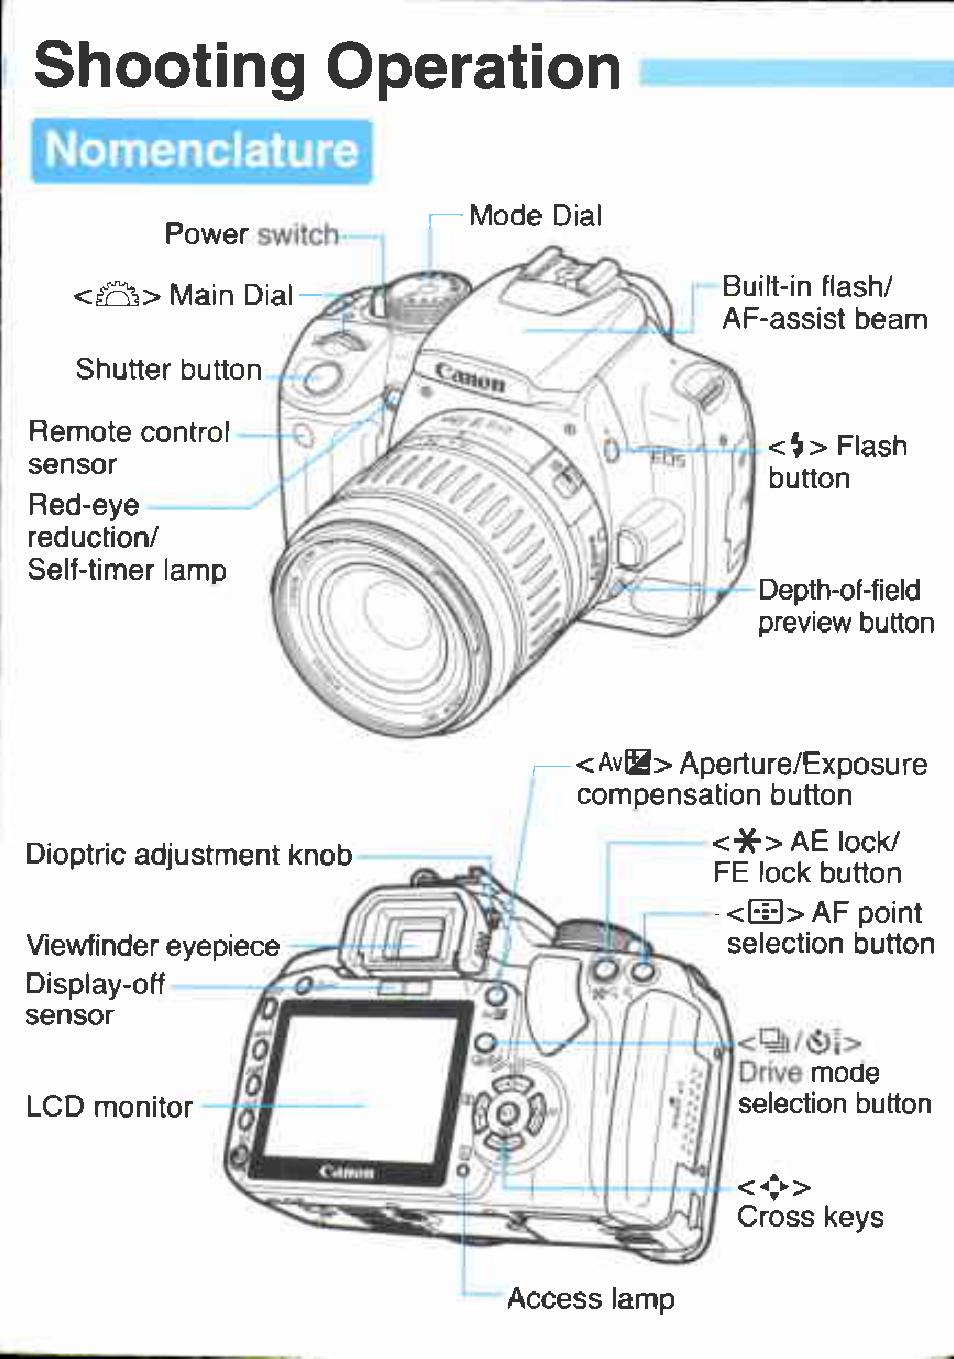 shooting operation nomenclature canon eos 400d user manual page rh manualsdir com canon eos 400d manuale italiano canon eos 40d manual download